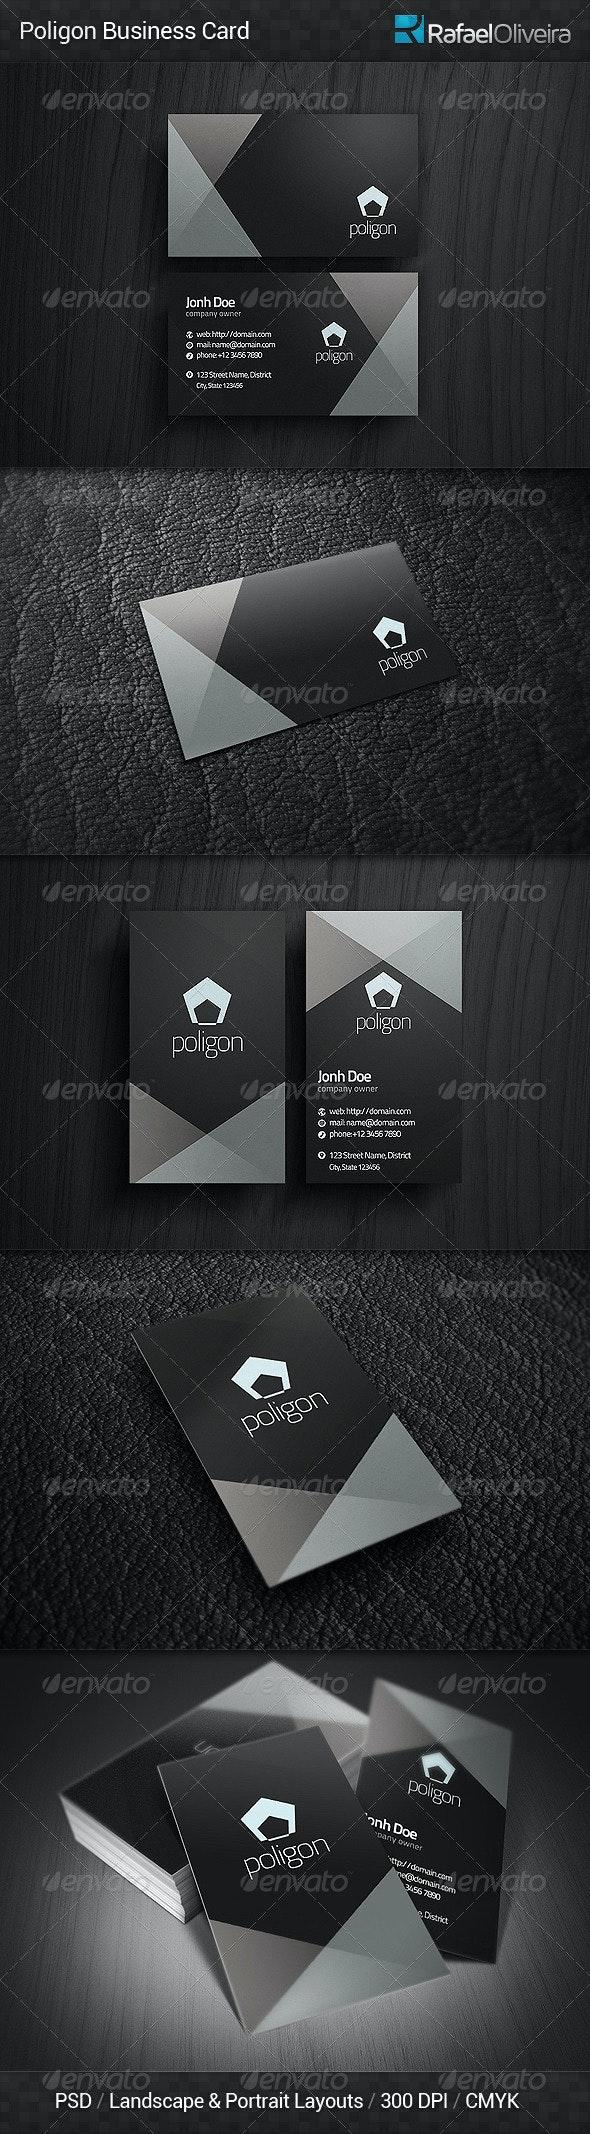 Poligon Business Card - Corporate Business Cards